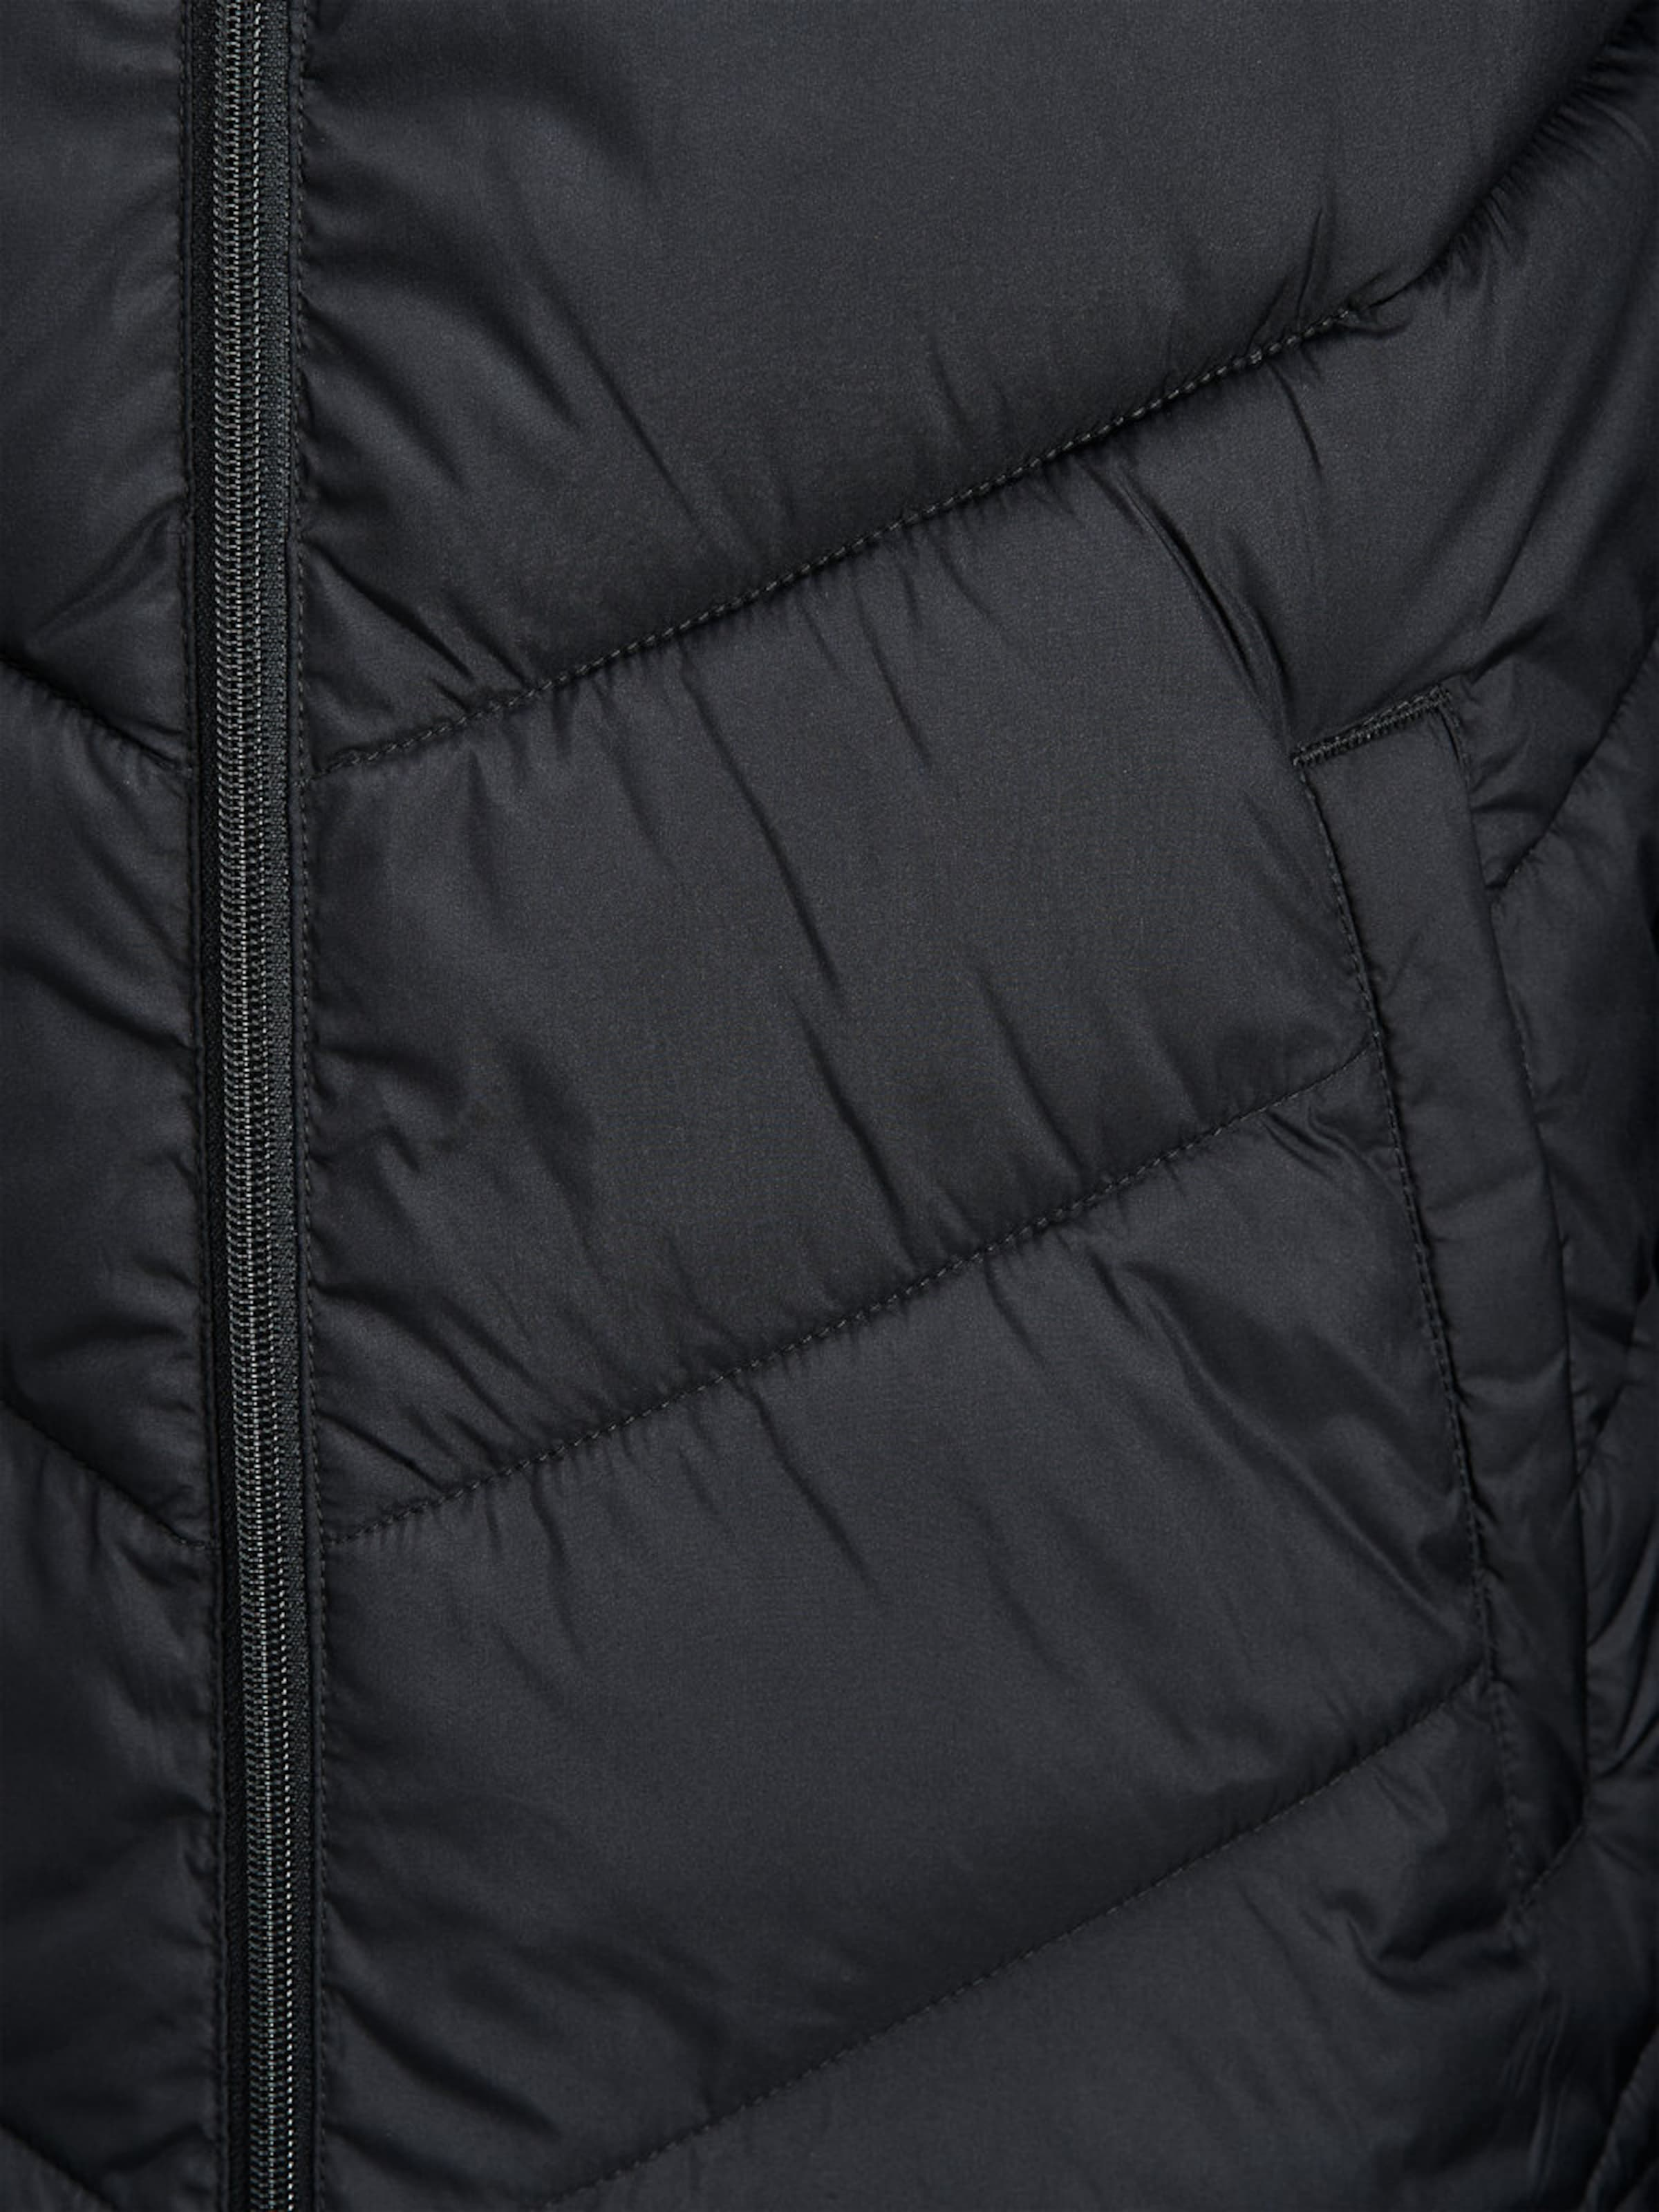 Produkt Veste Noir Mi saison En wm8nN0